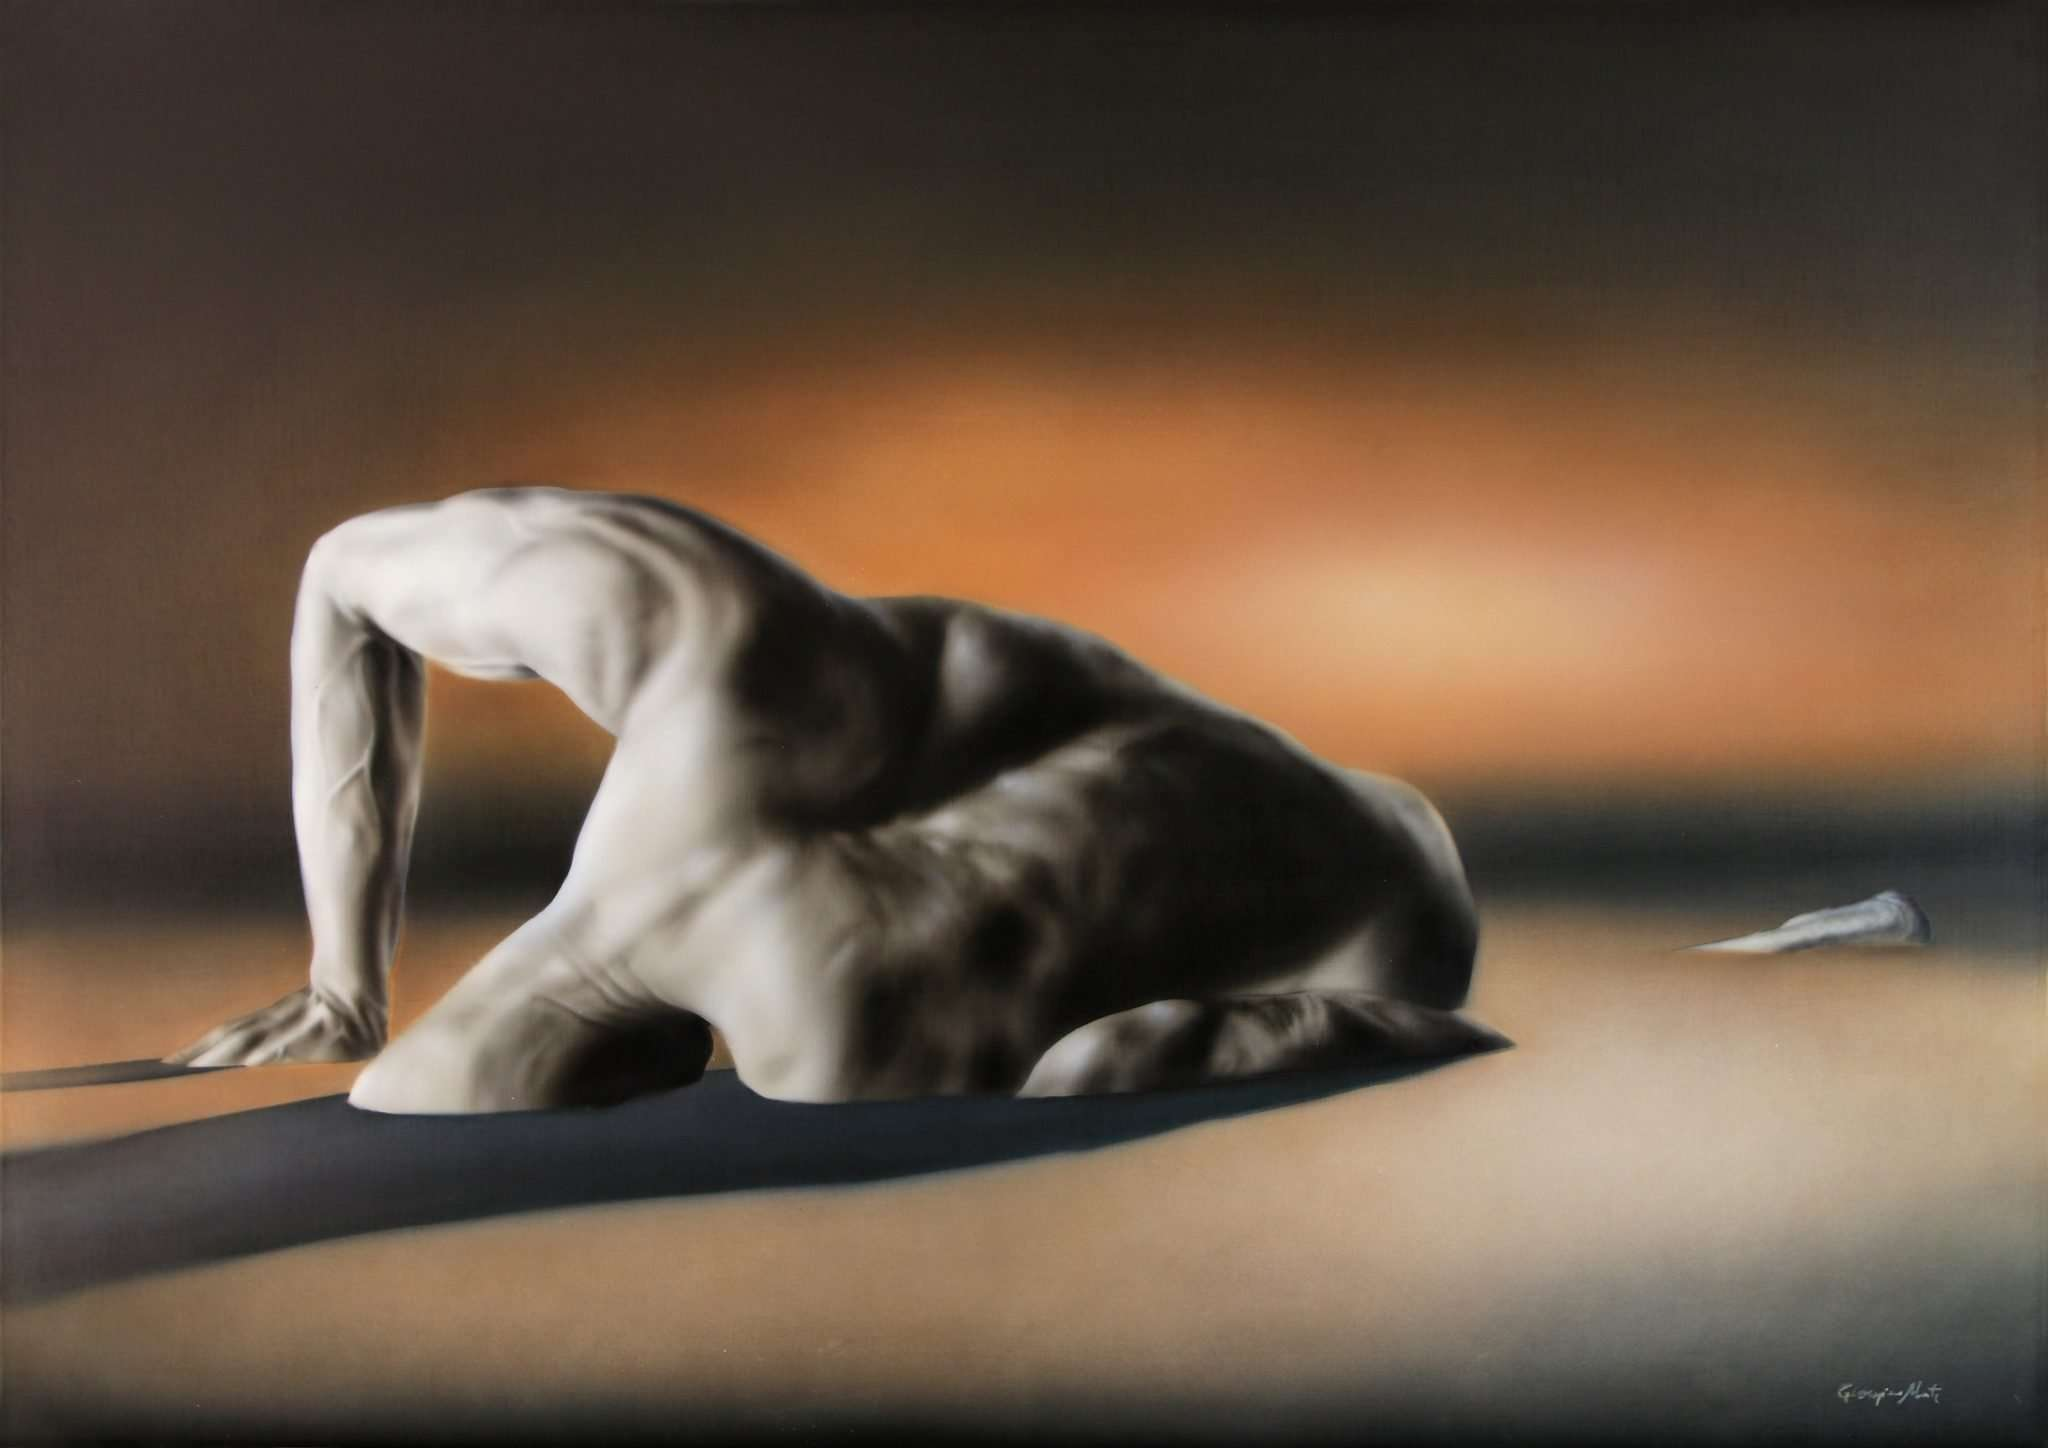 Genesi - Acrilico su tela - 70x50cm - Giampiero Abate